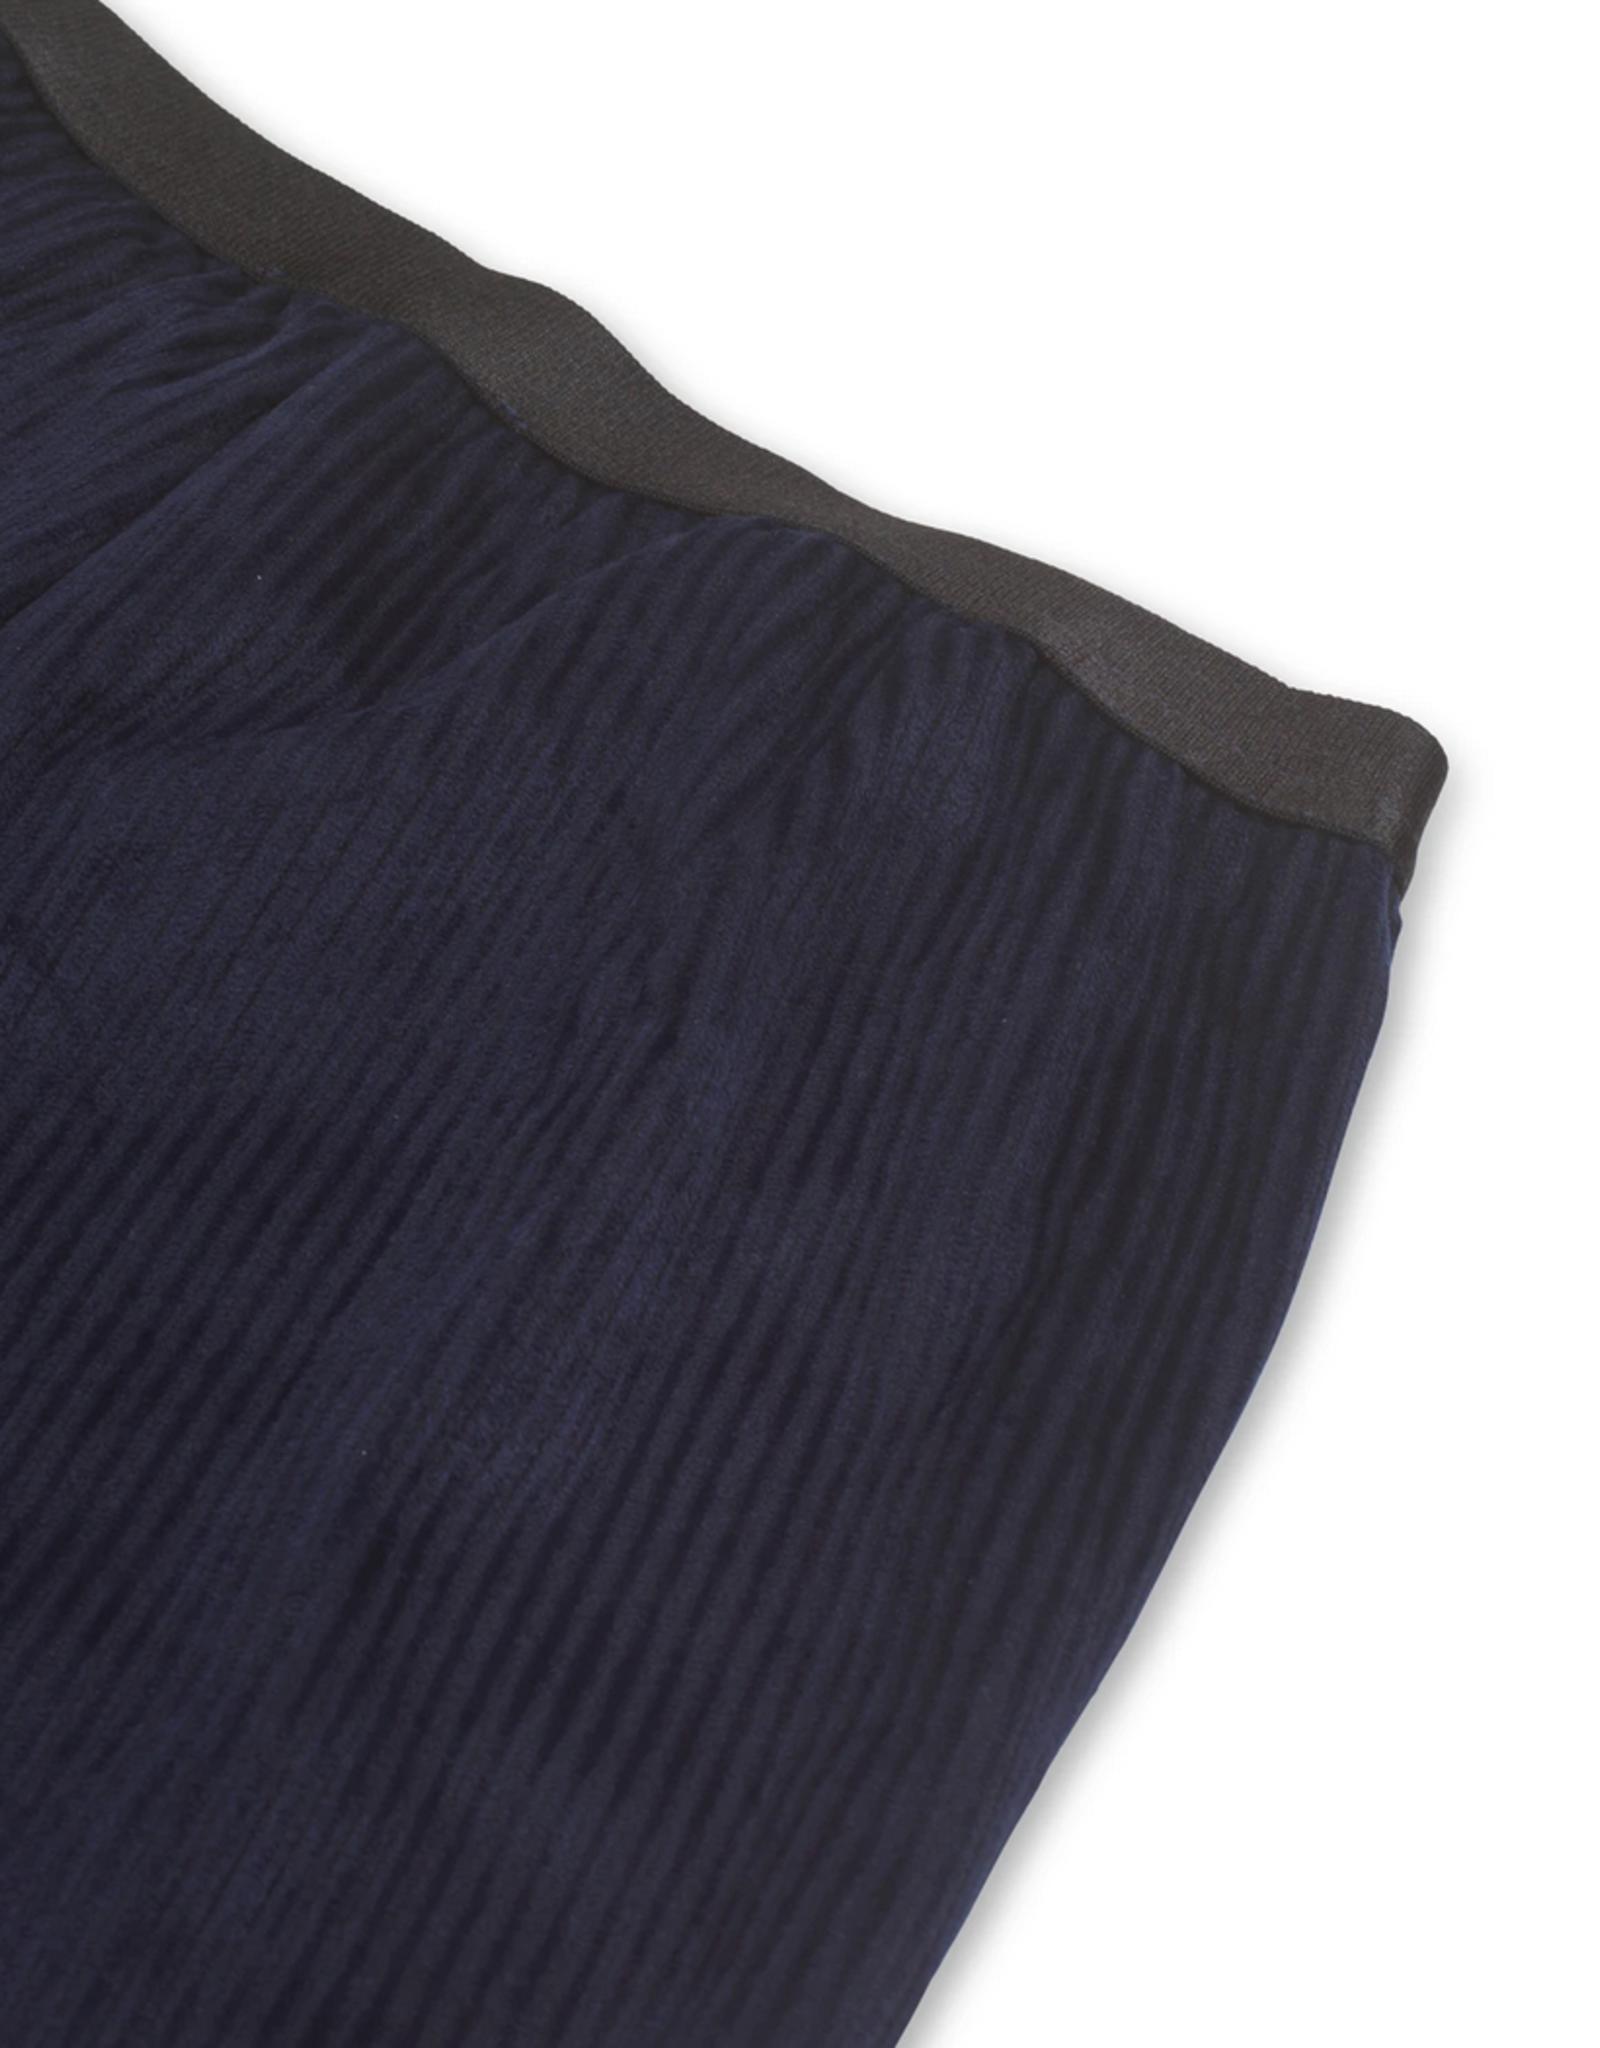 Pirla Pants Blue Corduroy